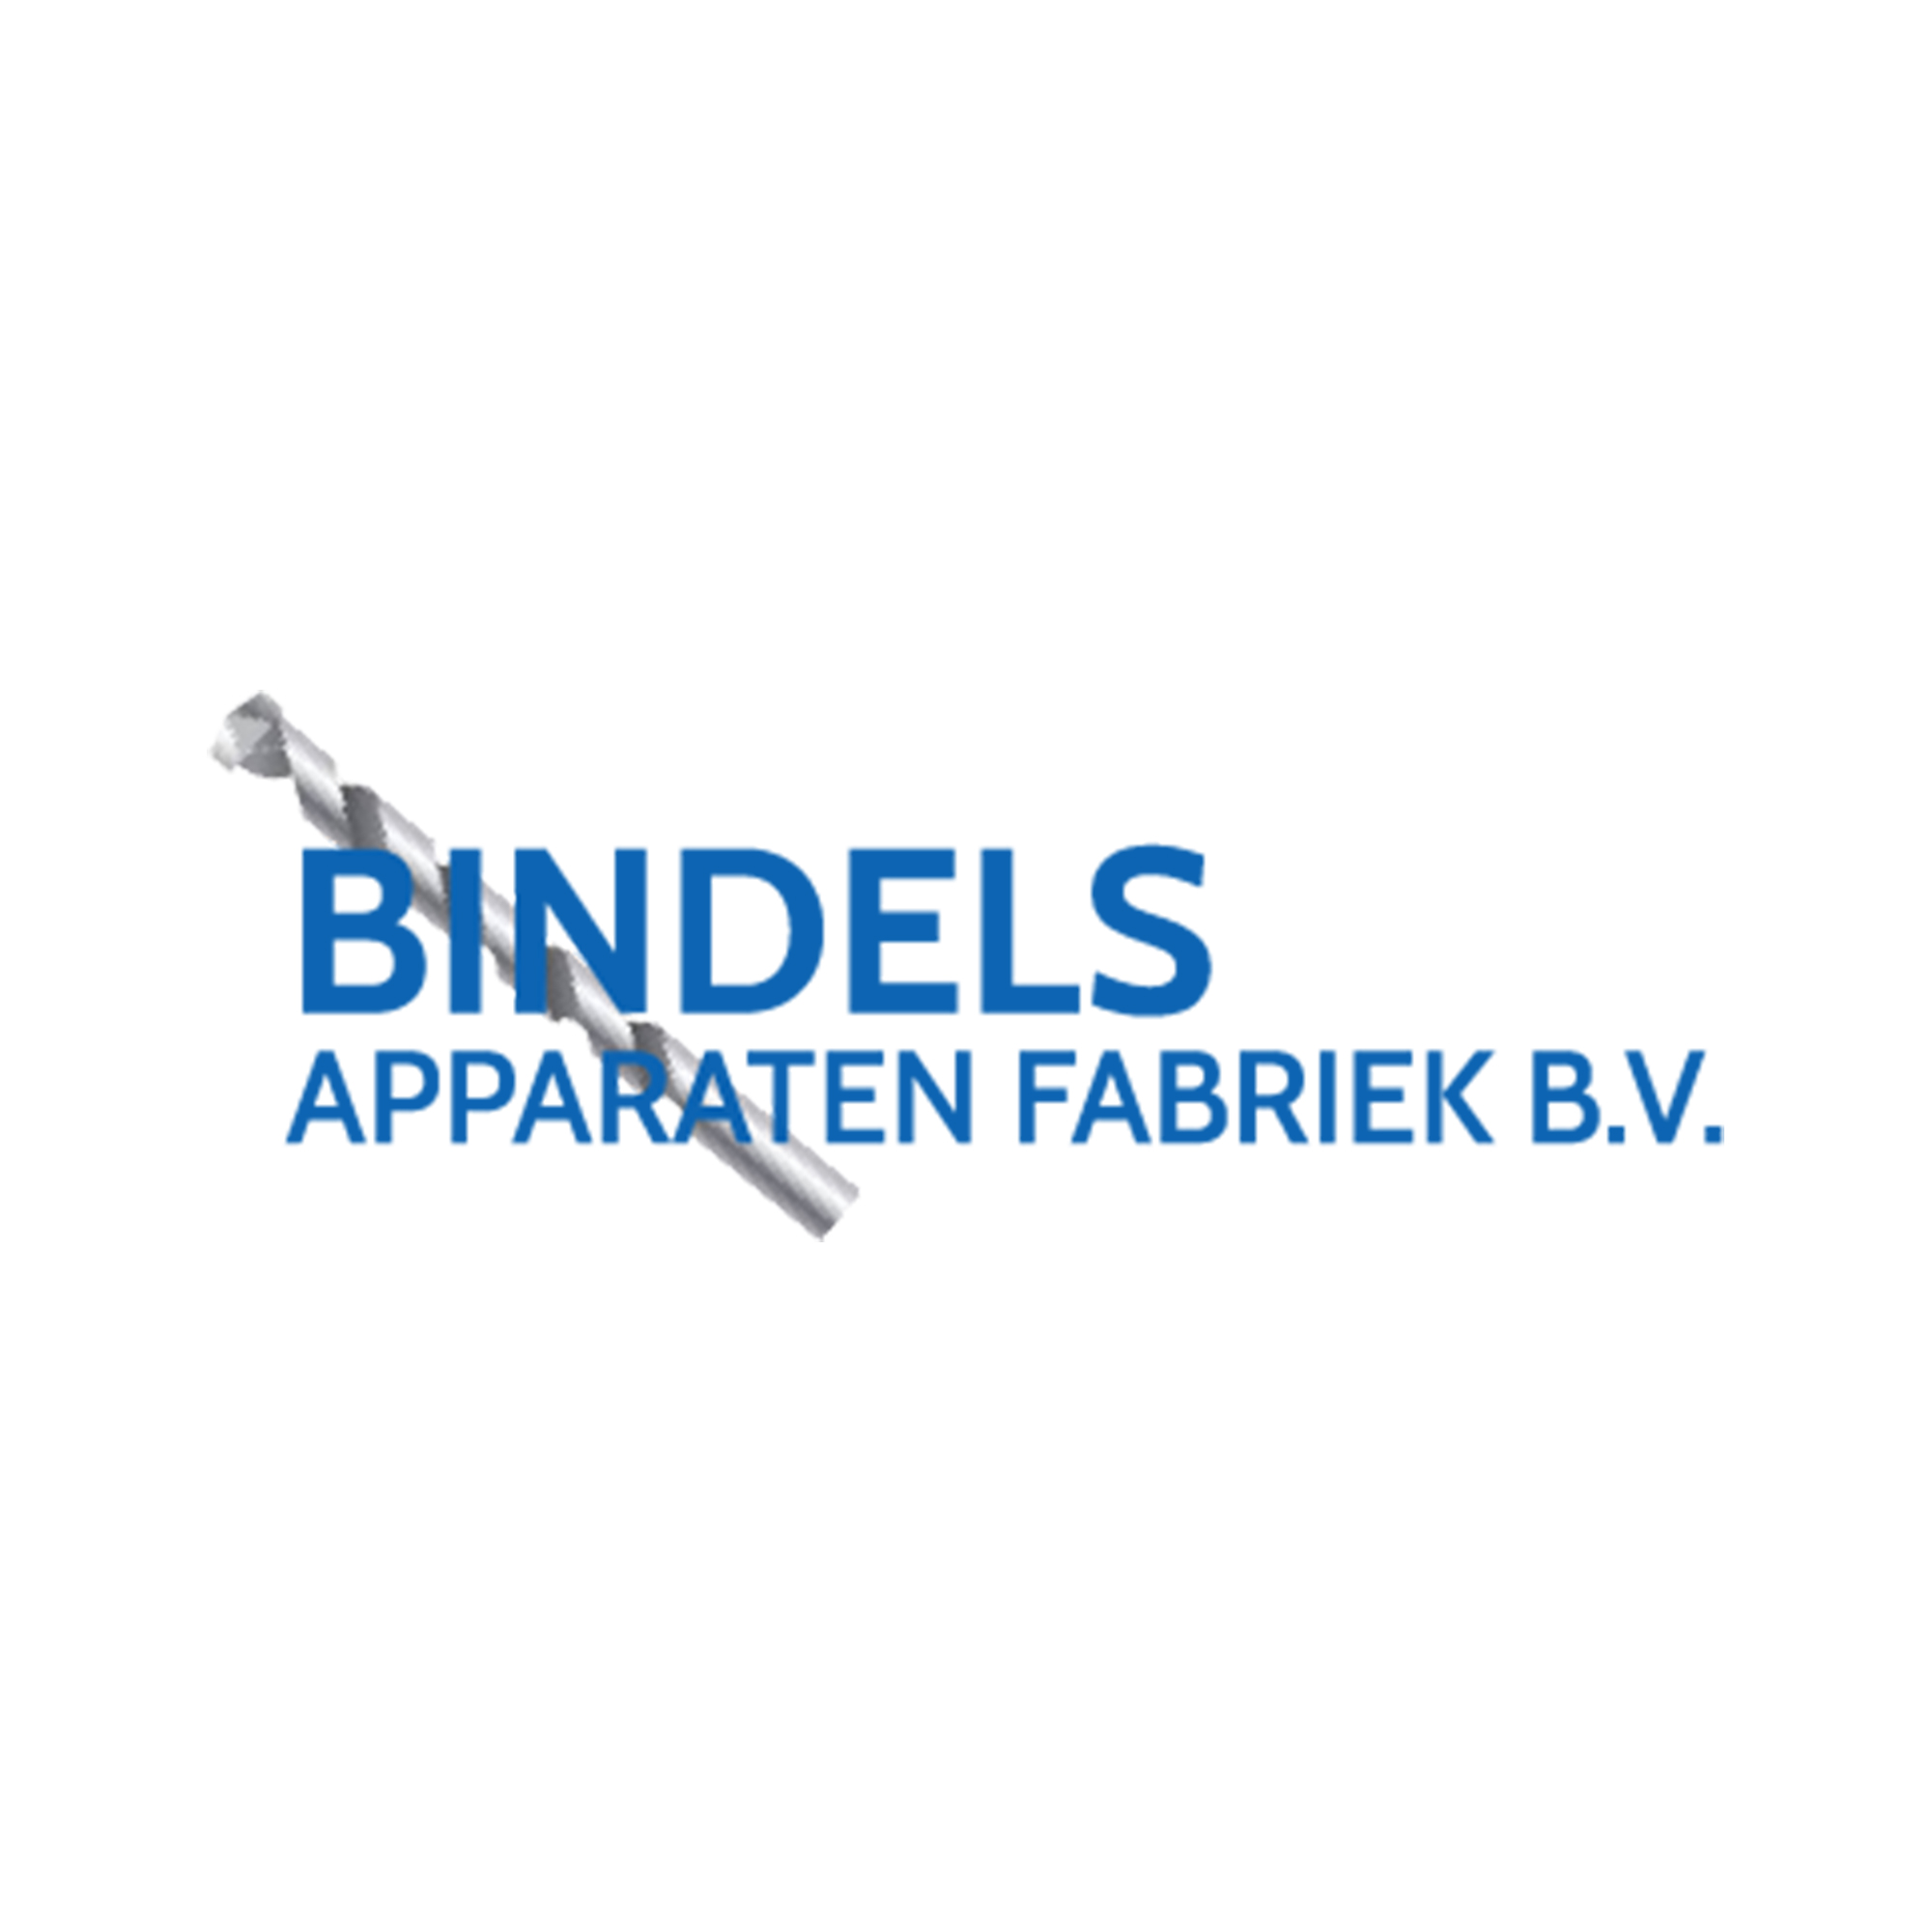 logo-Mockup-made-marketing-kennemer-bindels